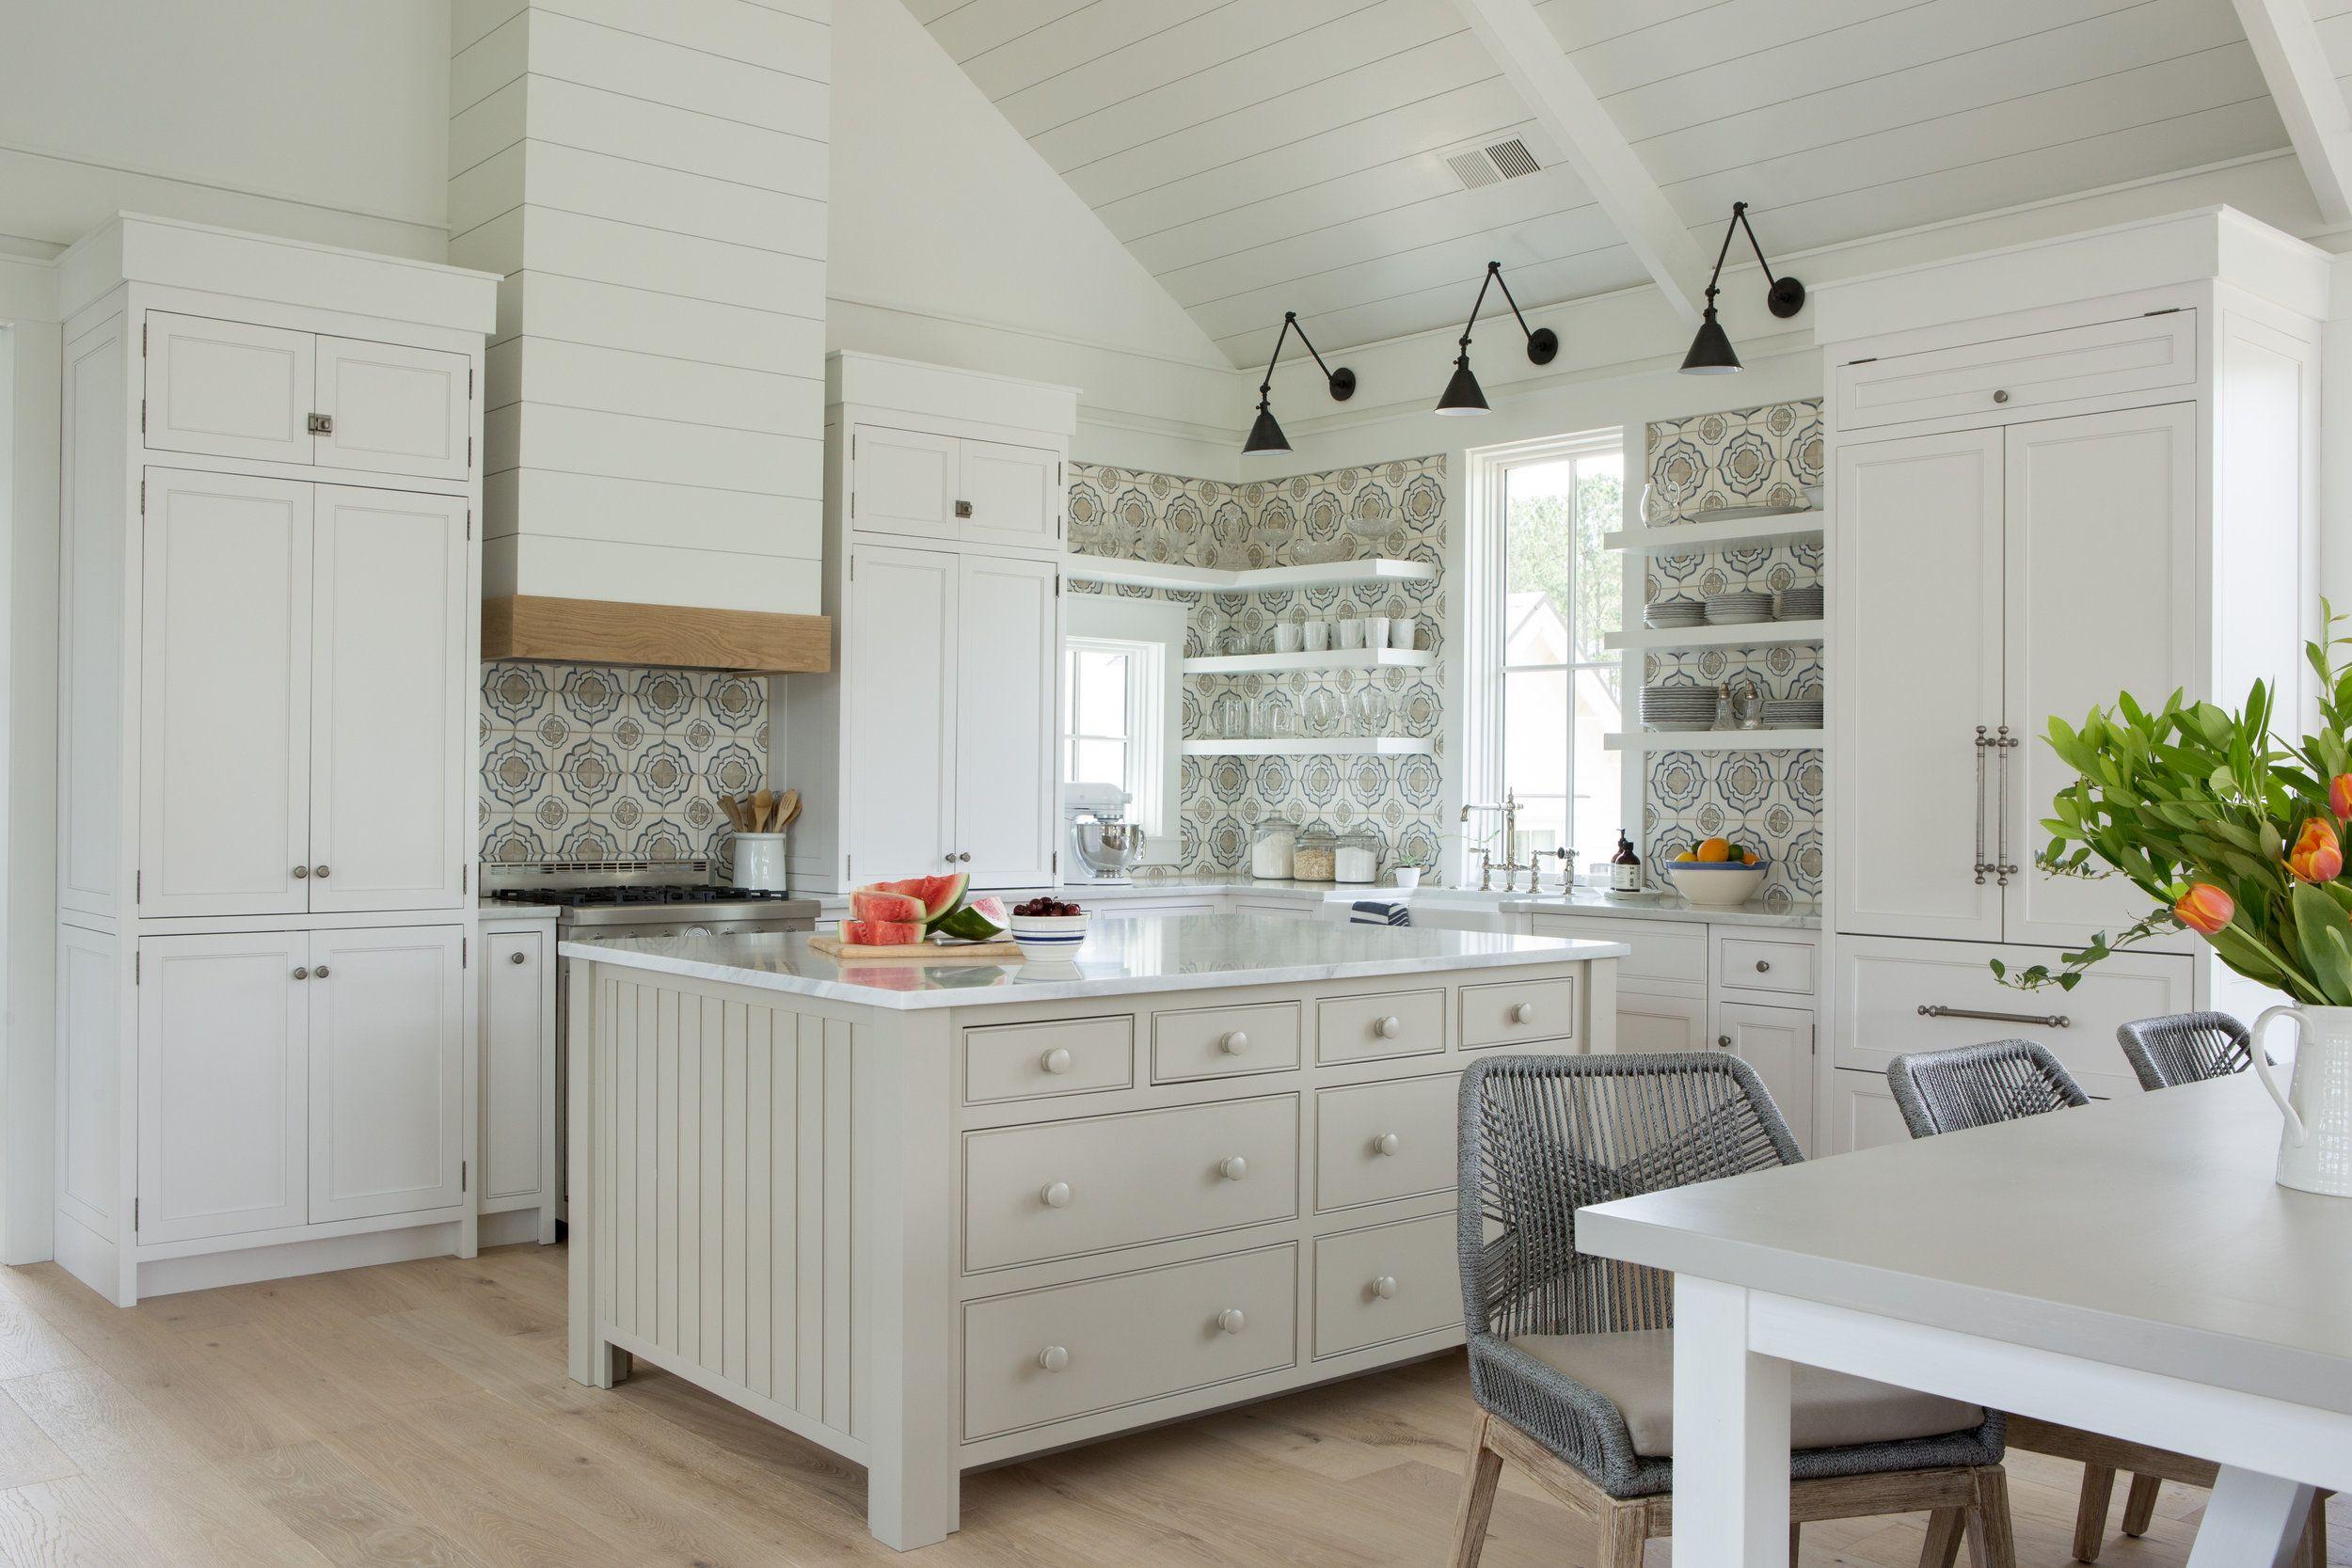 coastal cottage interior design inspiration part 1 get the look white cottage kitchens on kitchen interior farmhouse id=85508